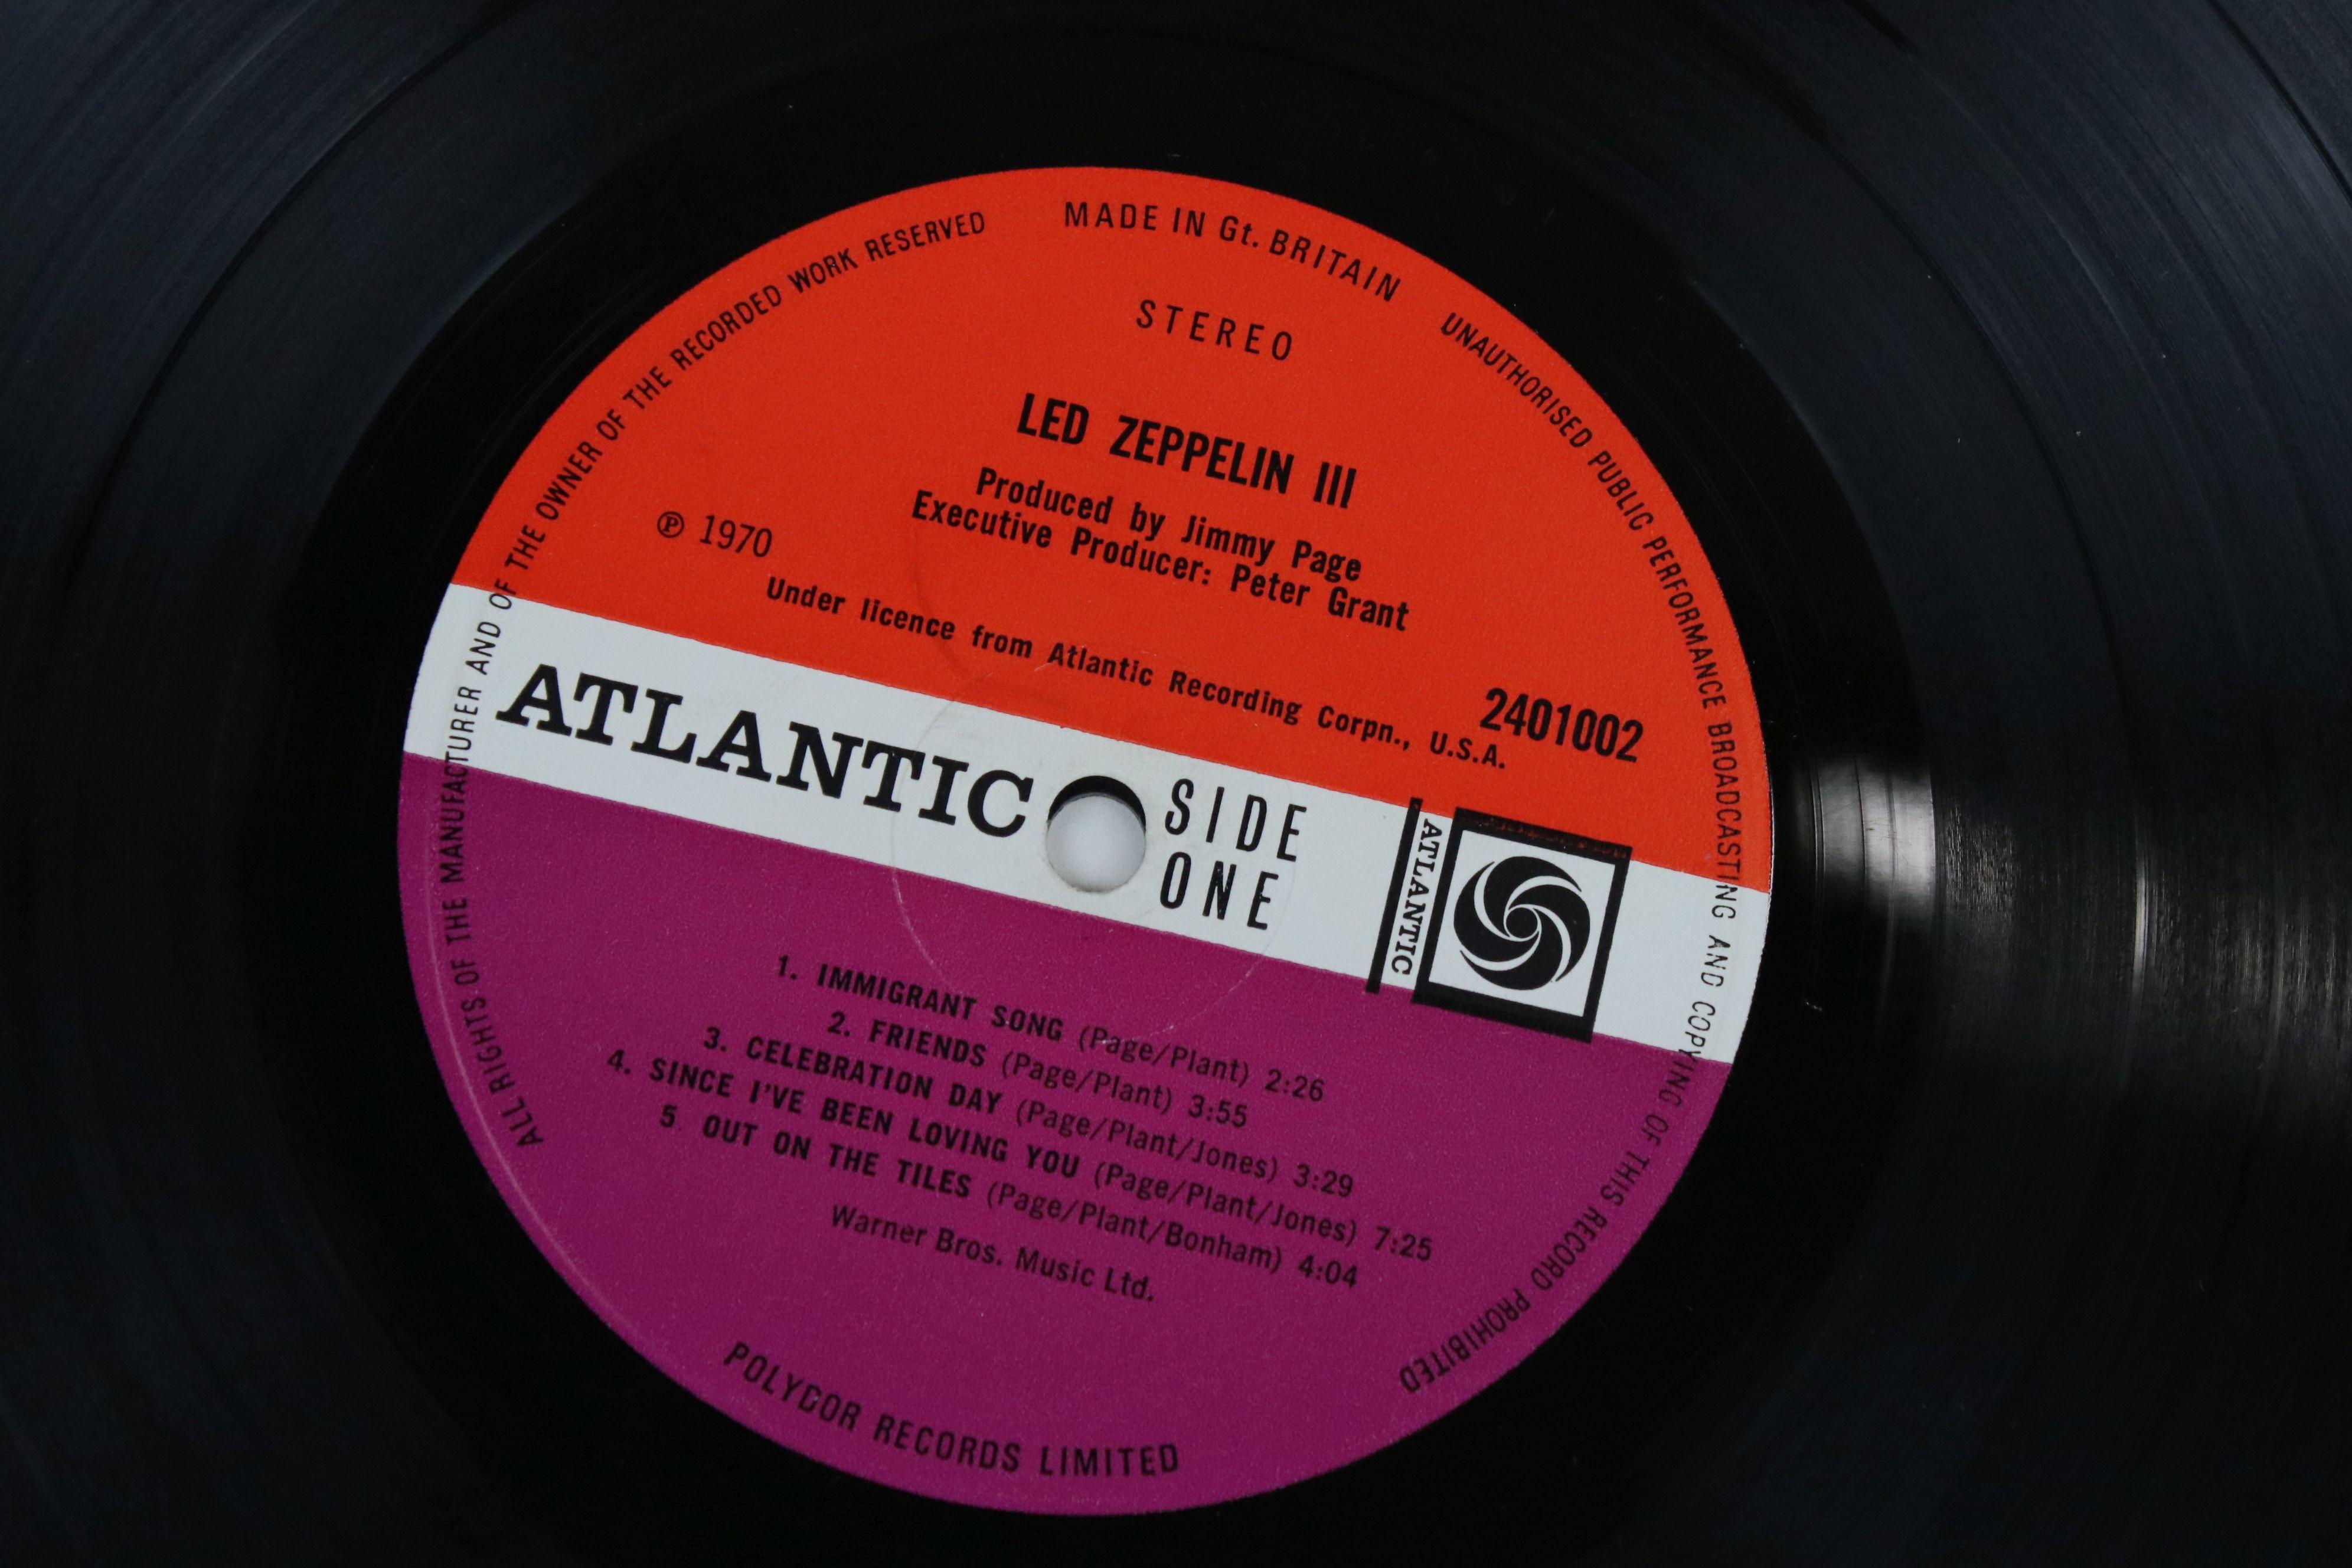 Vinyl - Led Zeppelin III LP on Atlantic Deluxe 2401002 red/maroon label, 1st pressing, sleeve vg - Image 3 of 7